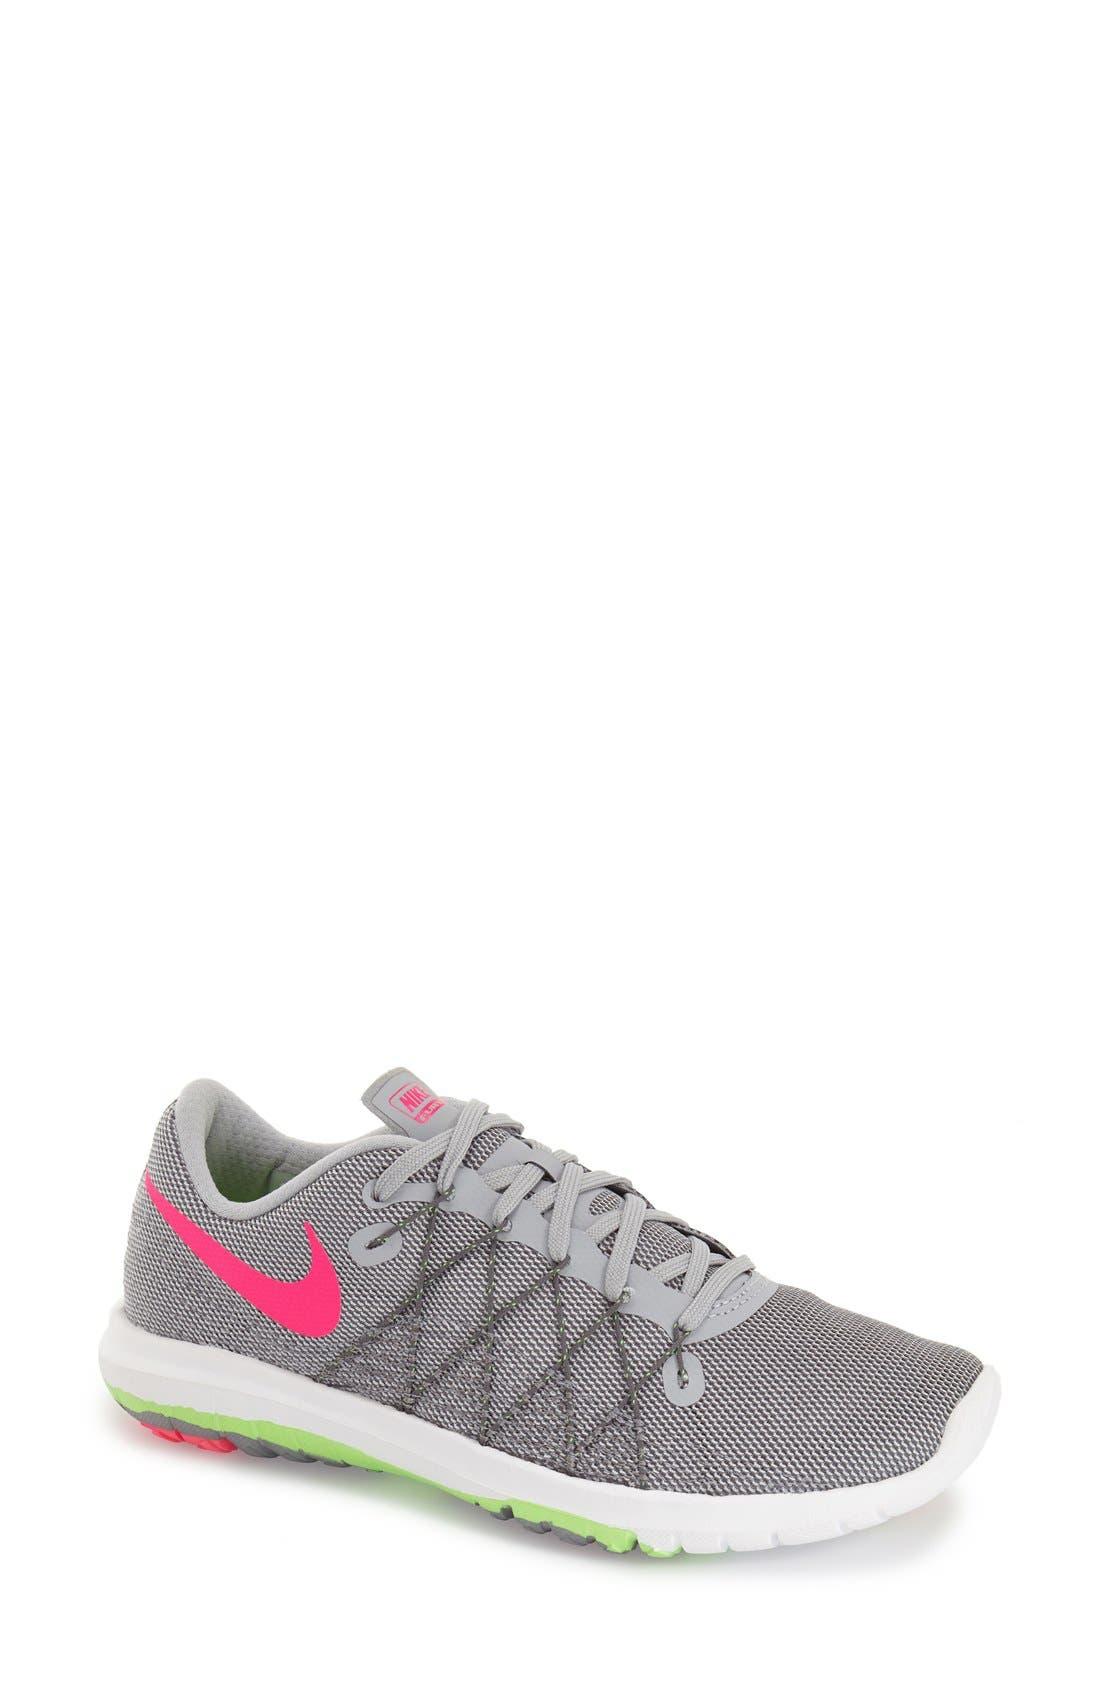 Alternate Image 1 Selected - Nike 'Flex Fury 2' Running Shoe (Women)